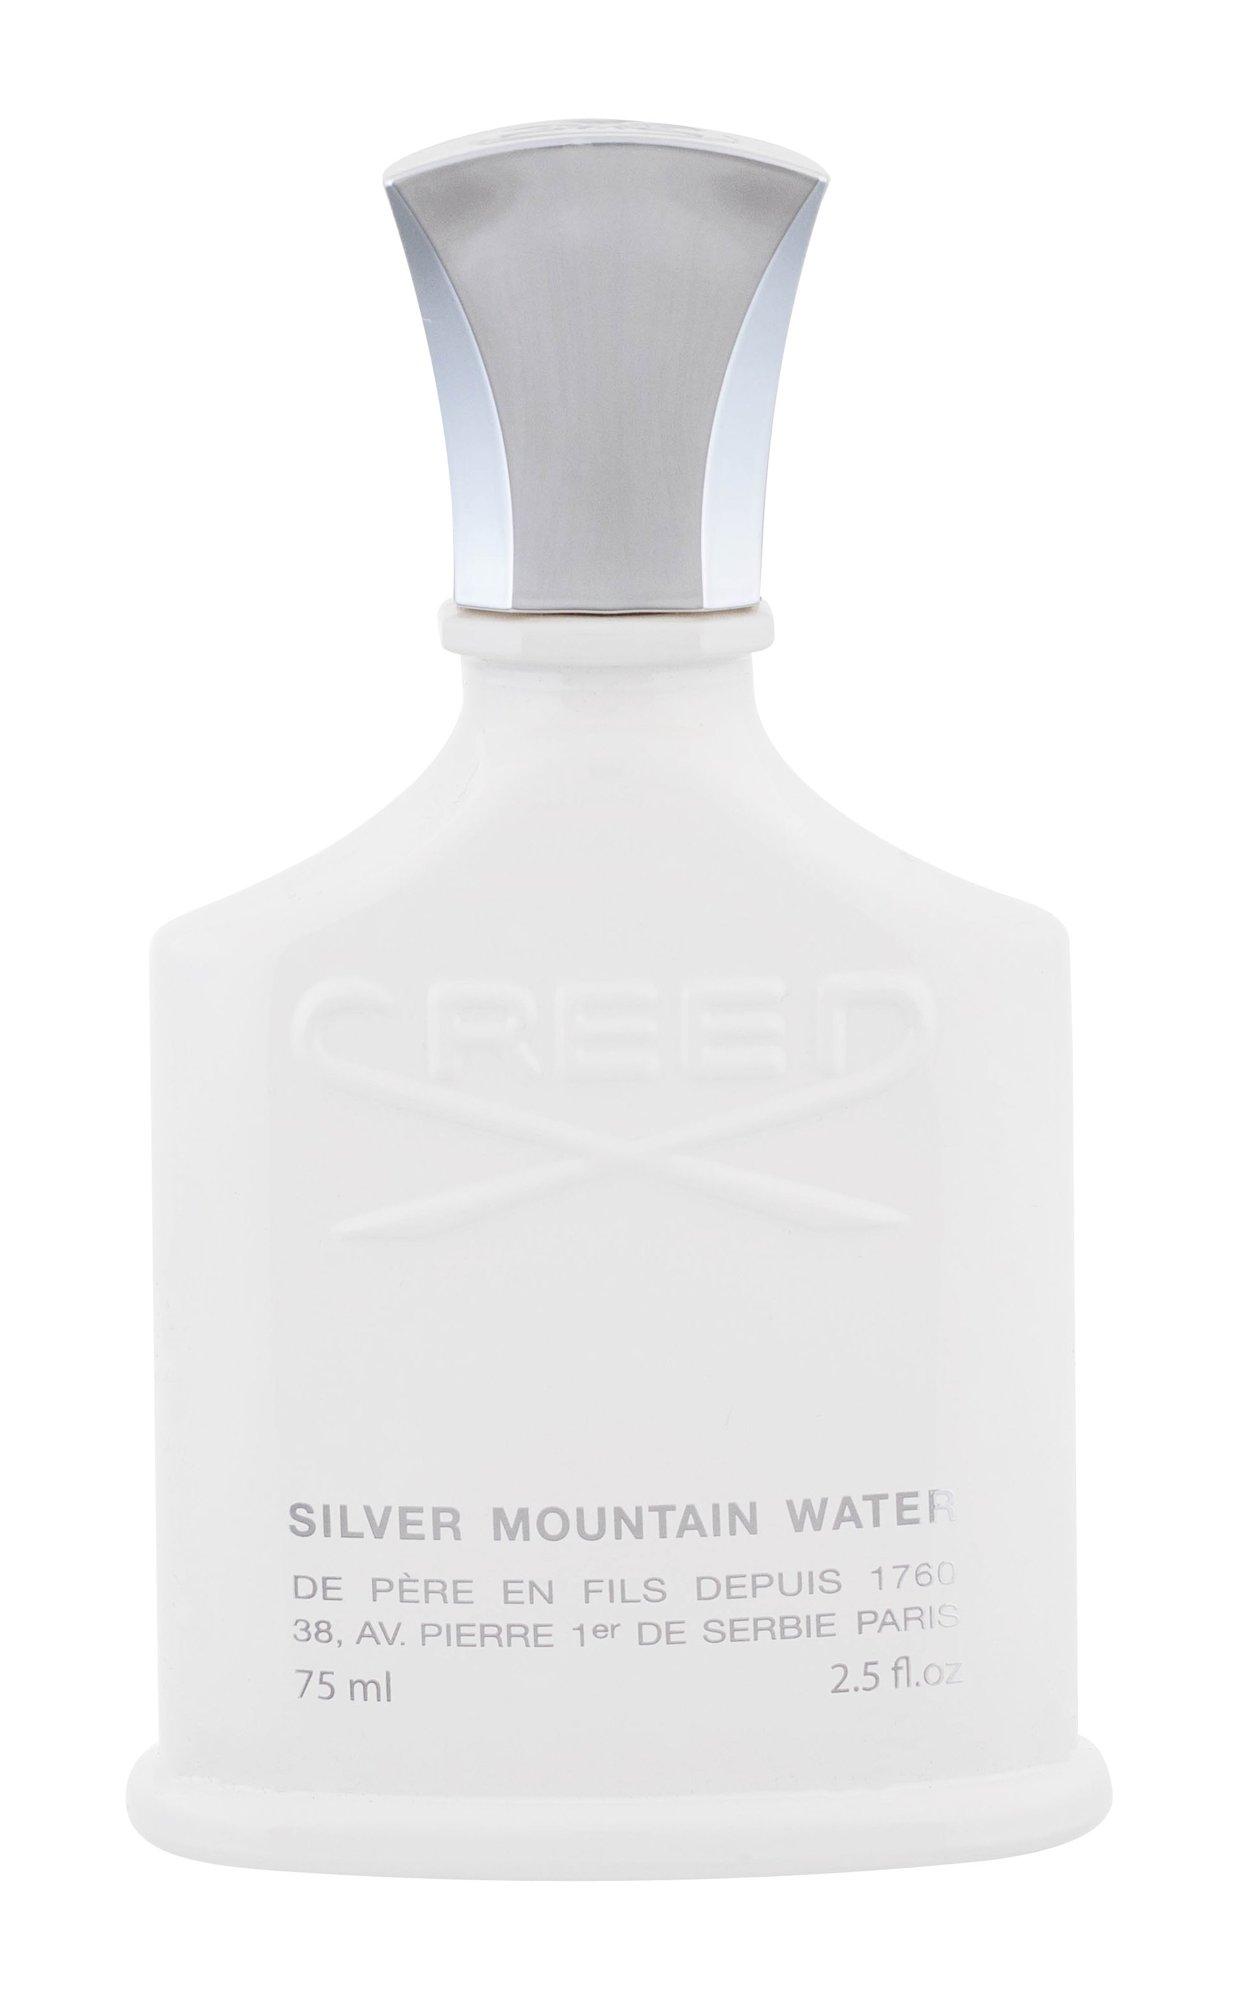 Creed Silver Mountain Water Eau de Parfum 75ml